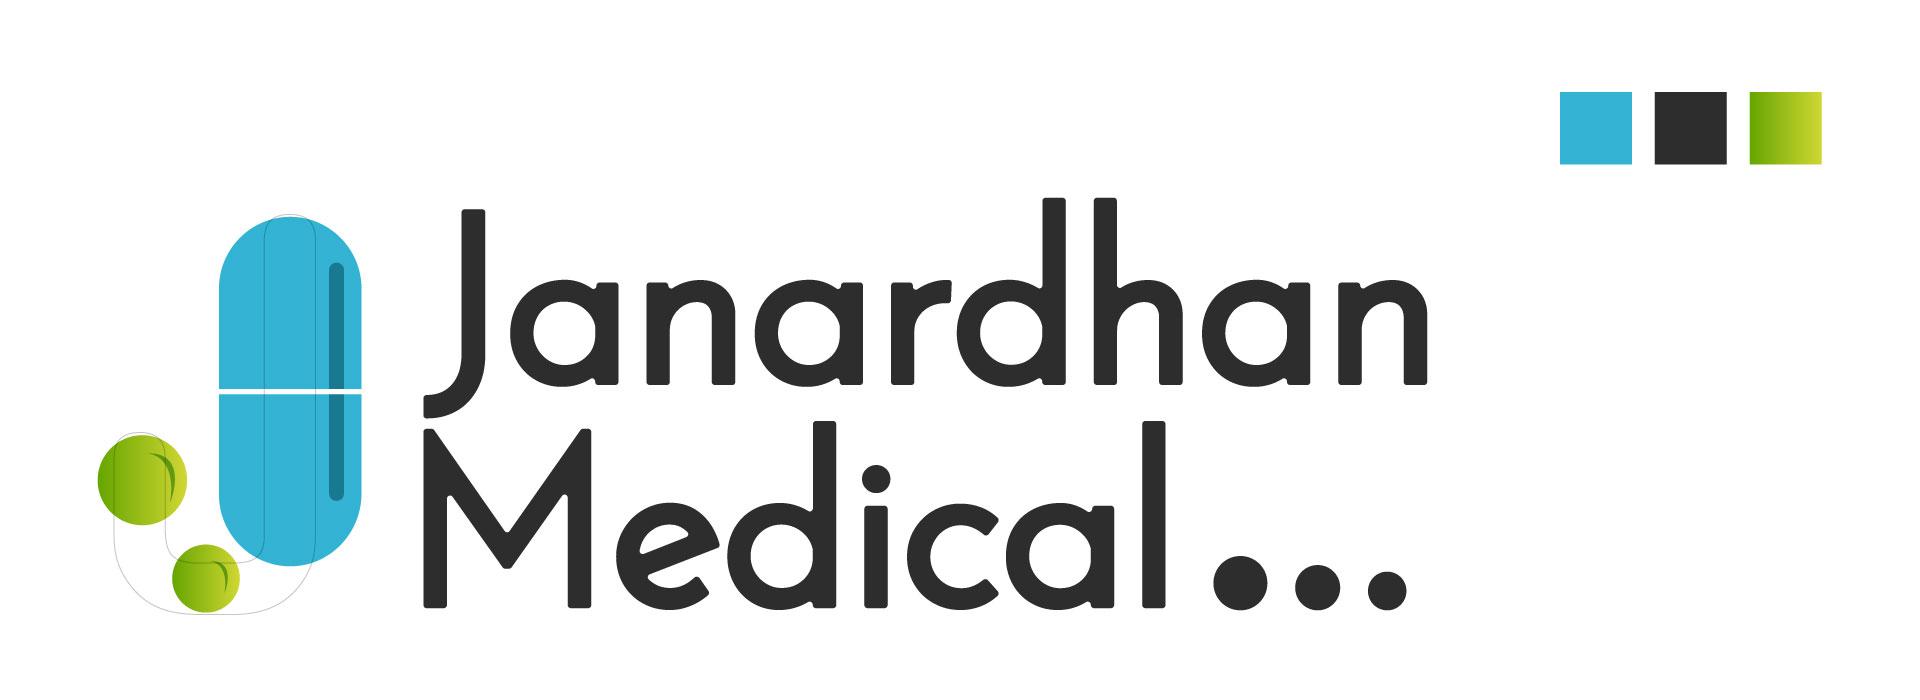 Janardhan-Logo-Color-Exploration-04